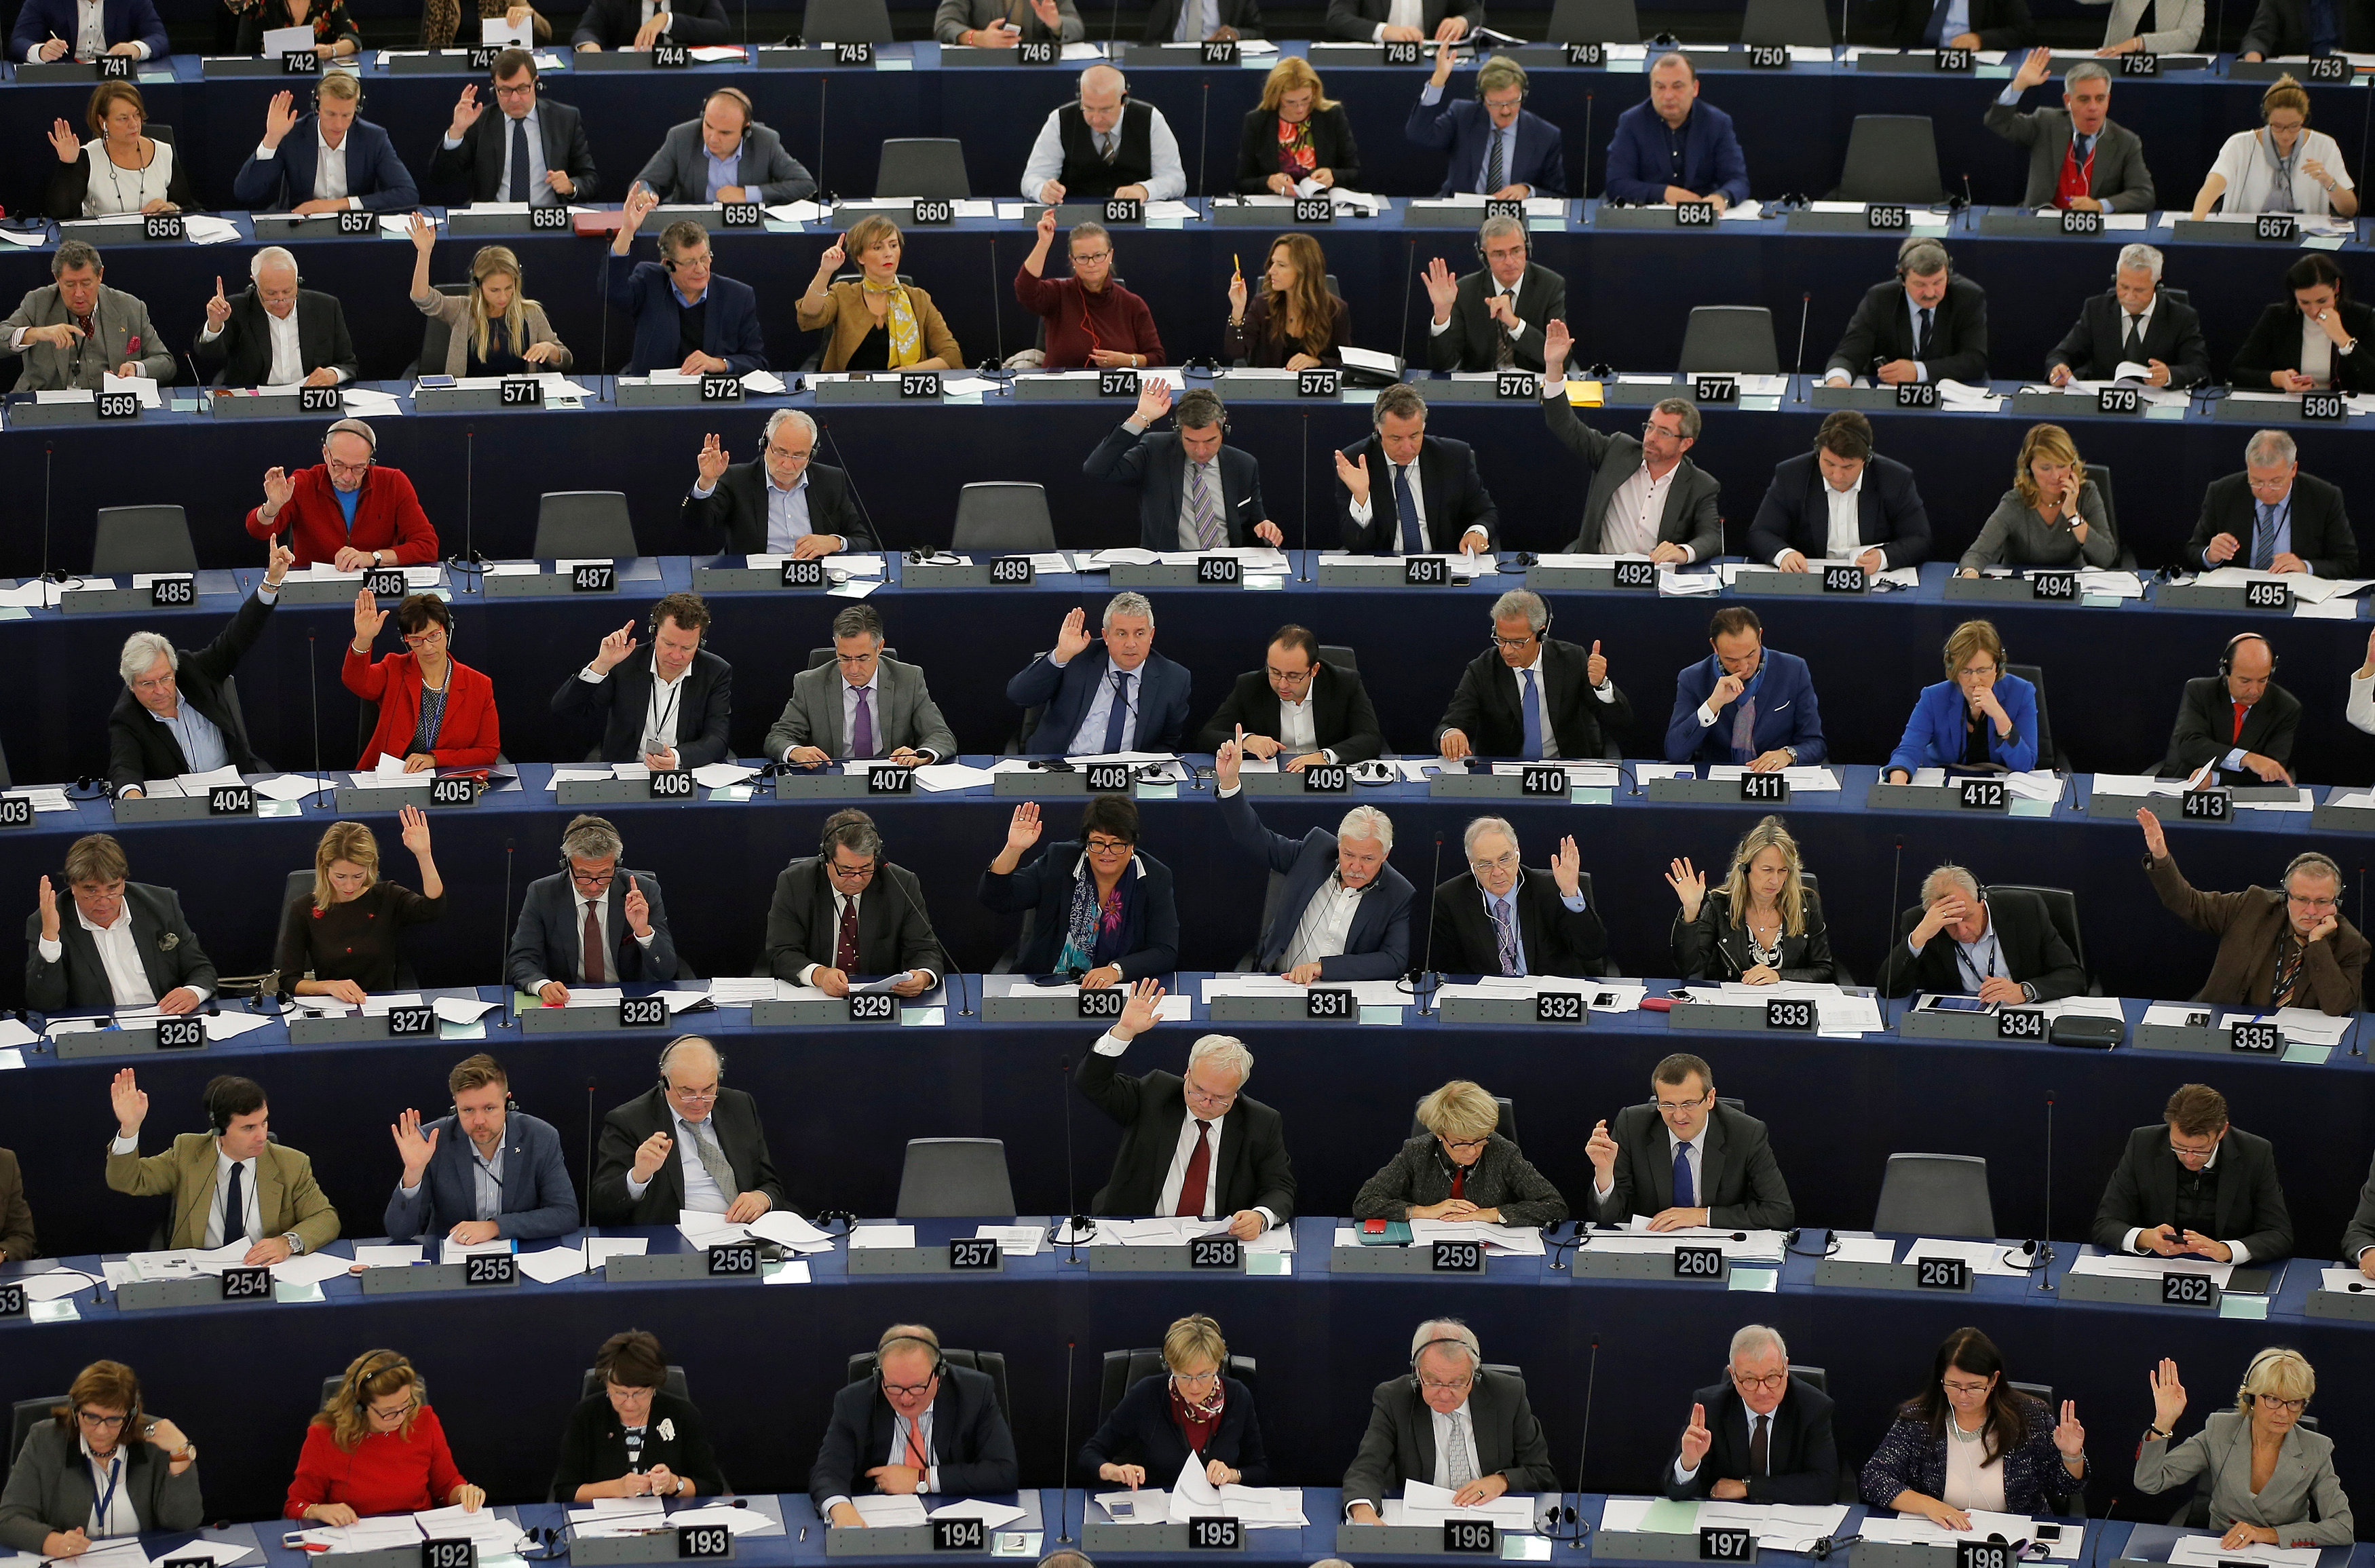 Members of the European Parliament take part in a voting session at the European Parliament in Strasbourg, France, October 25, 2016. (Vincent Kessler / Reuters)